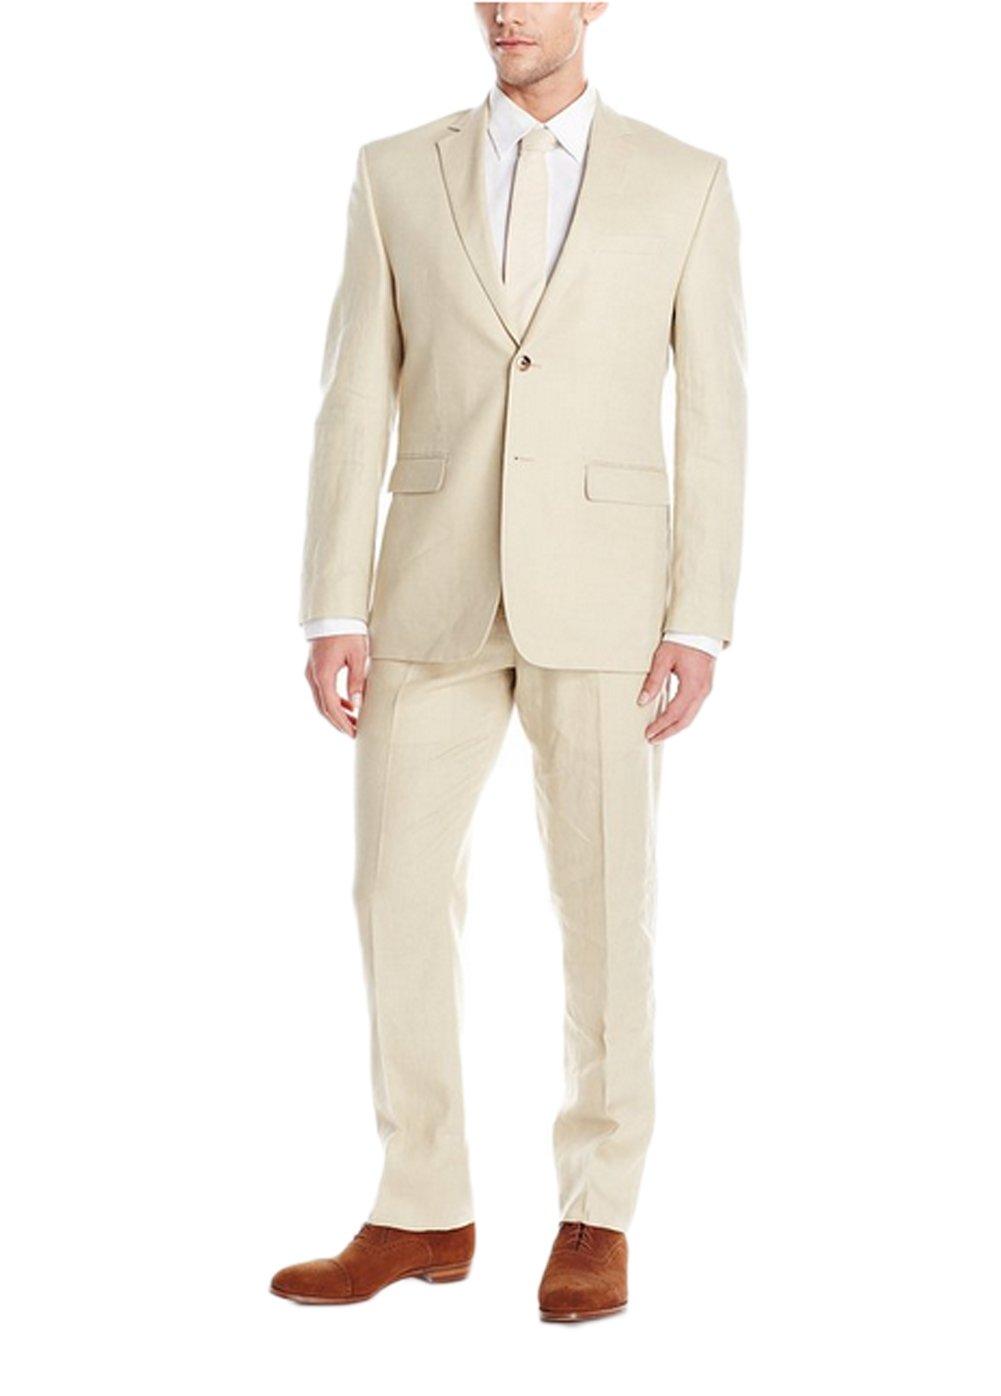 Love Dress Men's Two Button Suit with Flat Front Pant Tan L